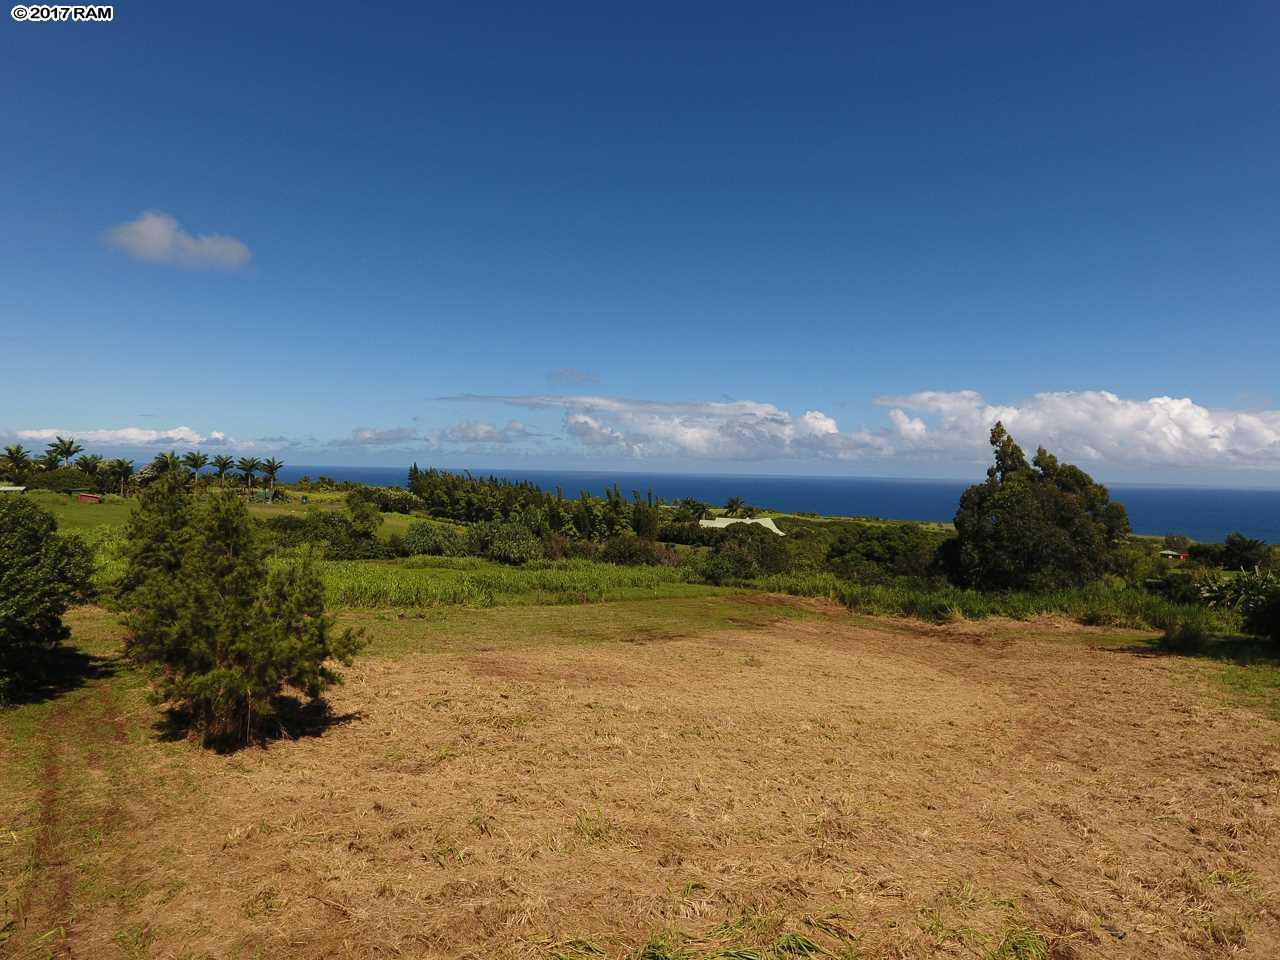 17 Manawai Pl Lot 1  Haiku, Hi 96708 vacant land - photo 3 of 4